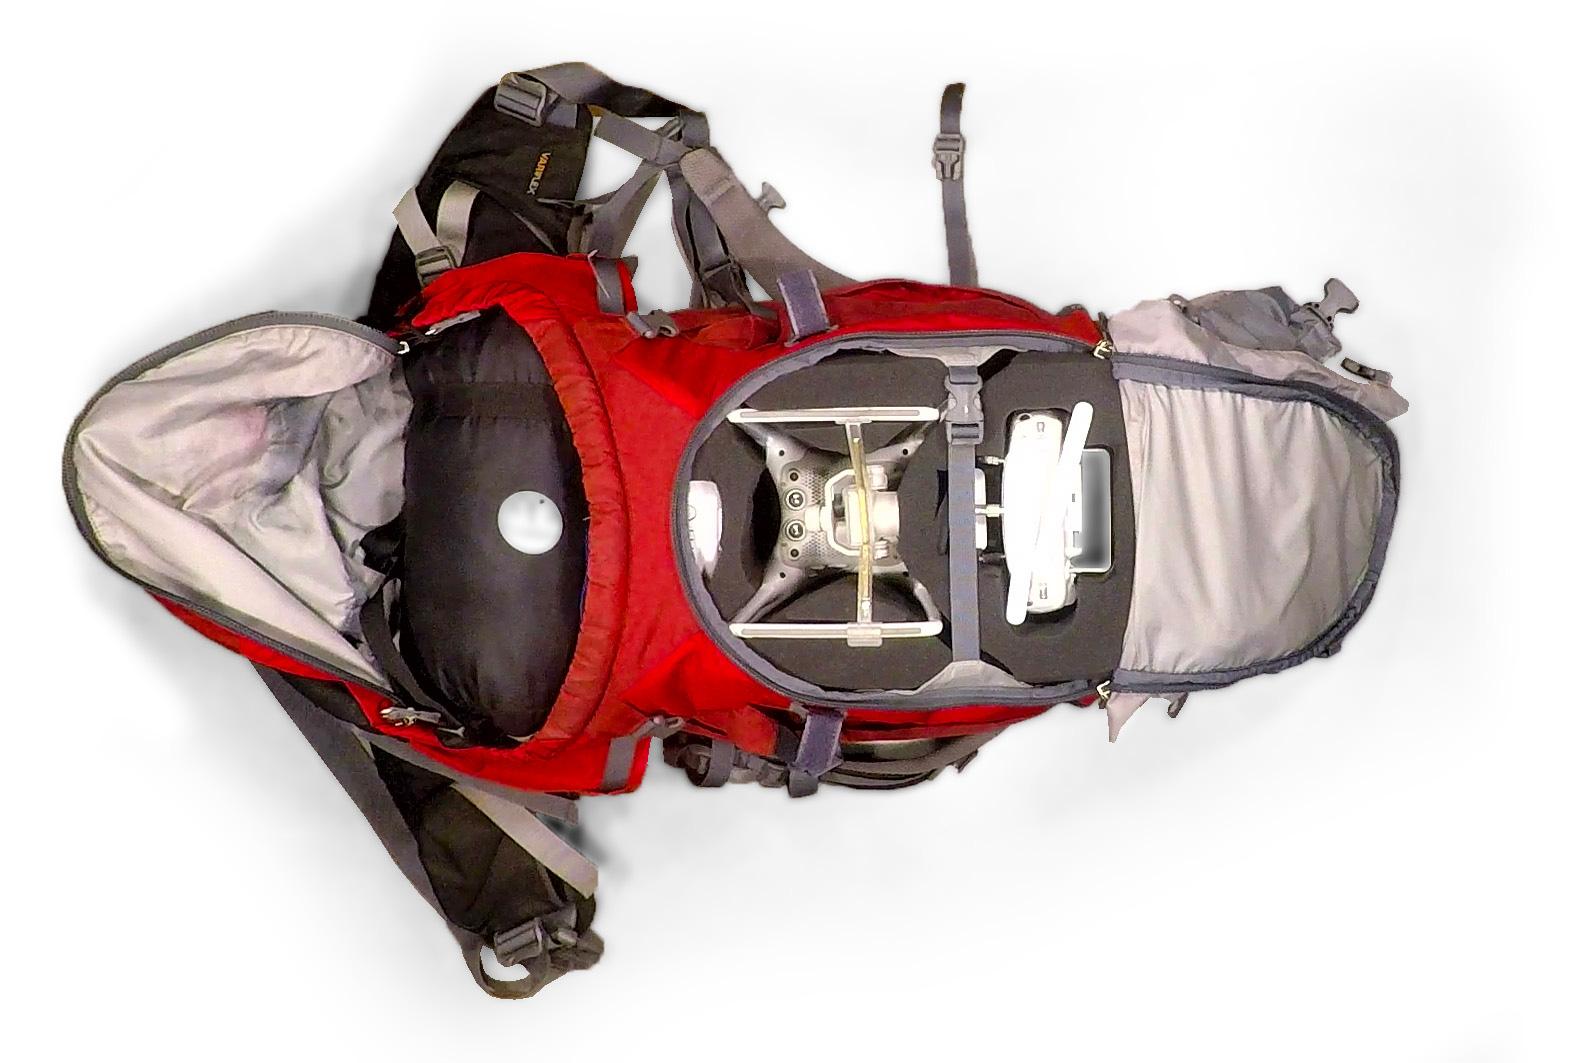 DIY Drone Case for DJI Phantom 4 in Deuter SL 60 backpack